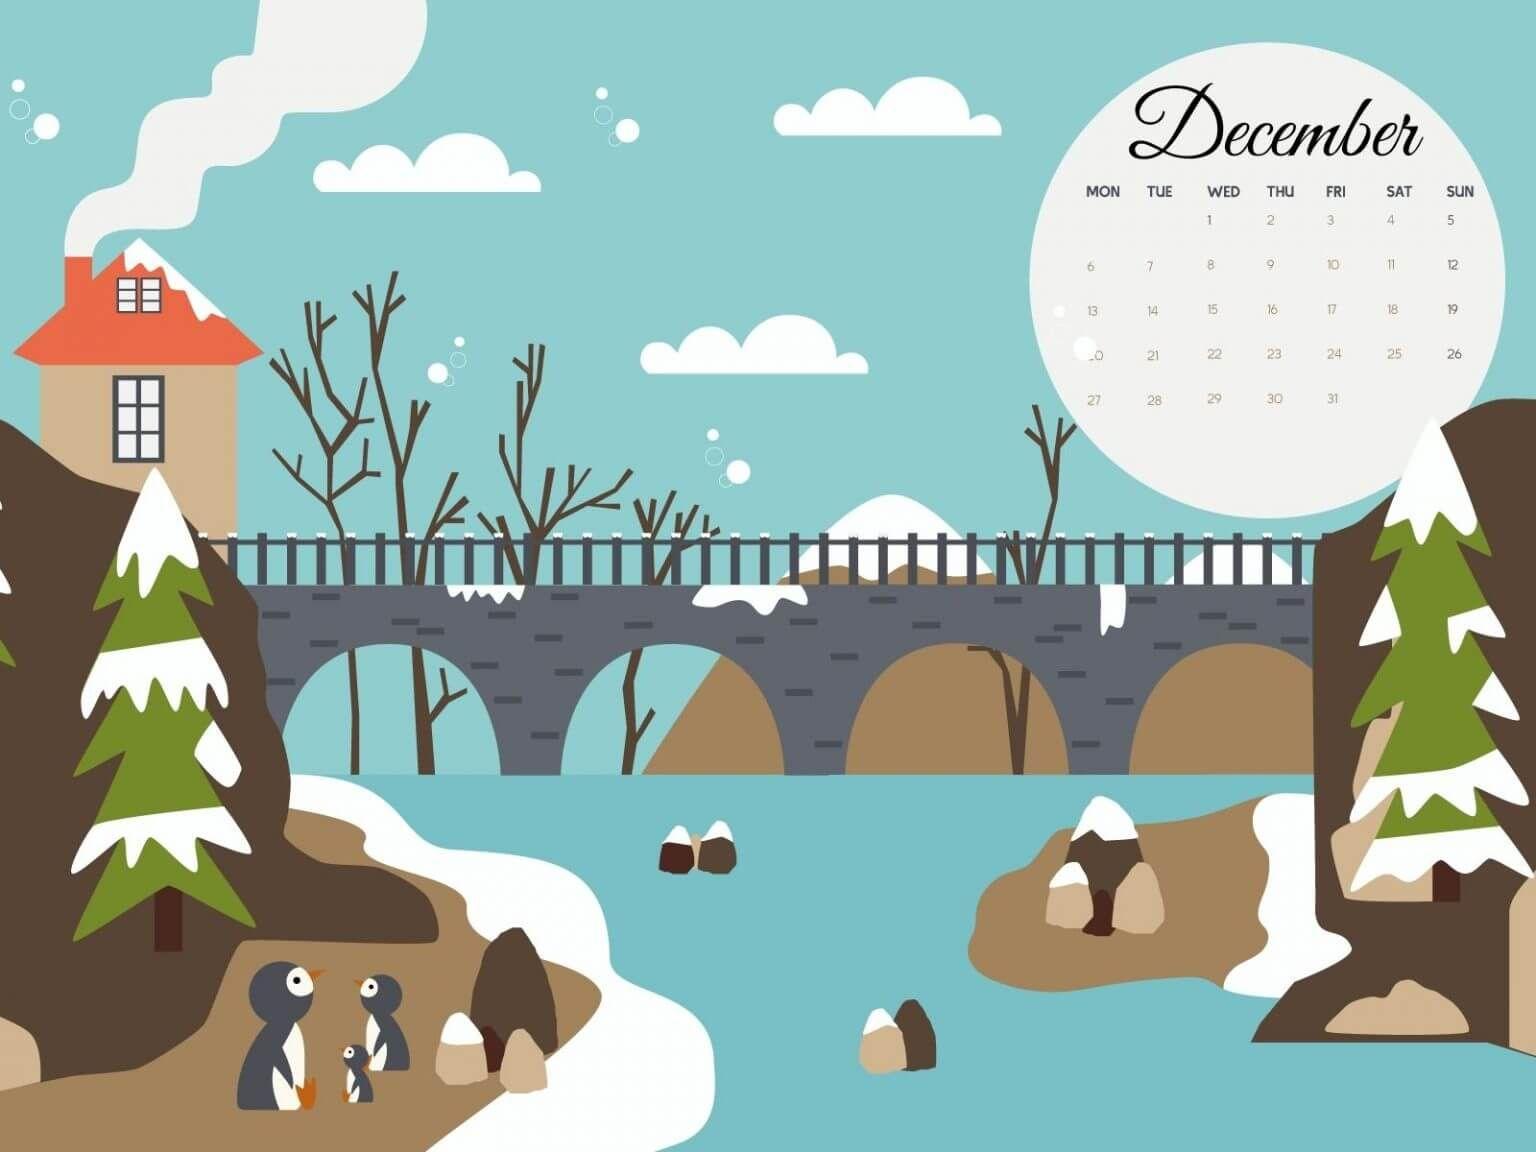 December 2021 Calendar Wallpaper For Laptop